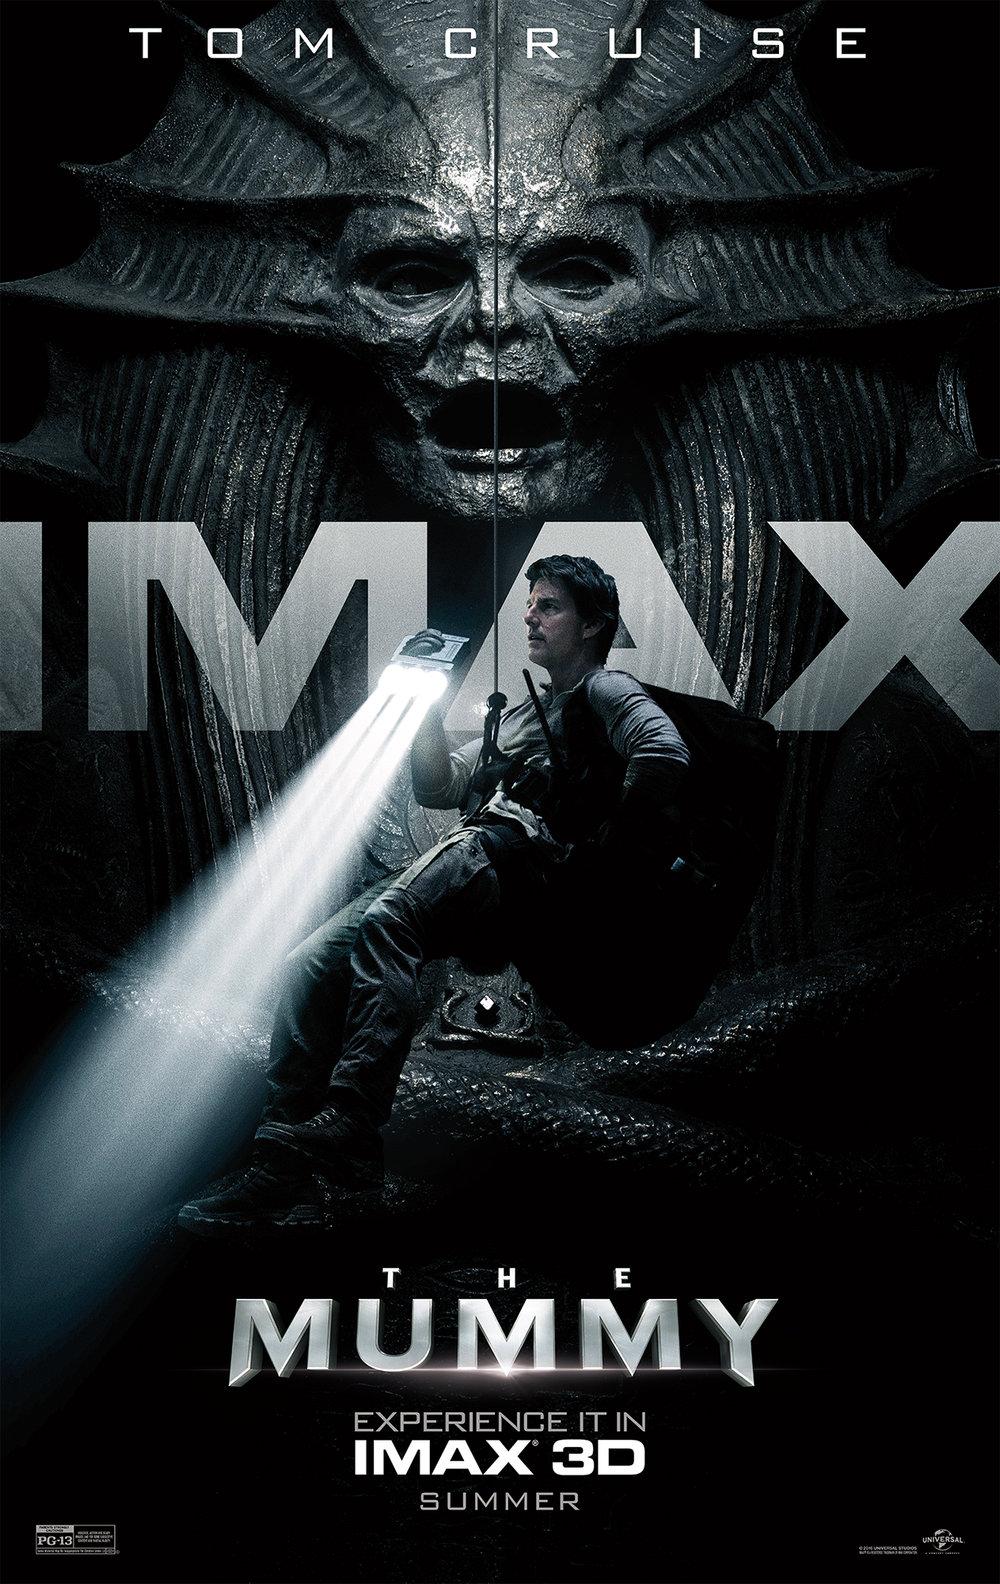 TheMummy_IMAX_1Sht_Sarc_2500px_100dpi.jpg